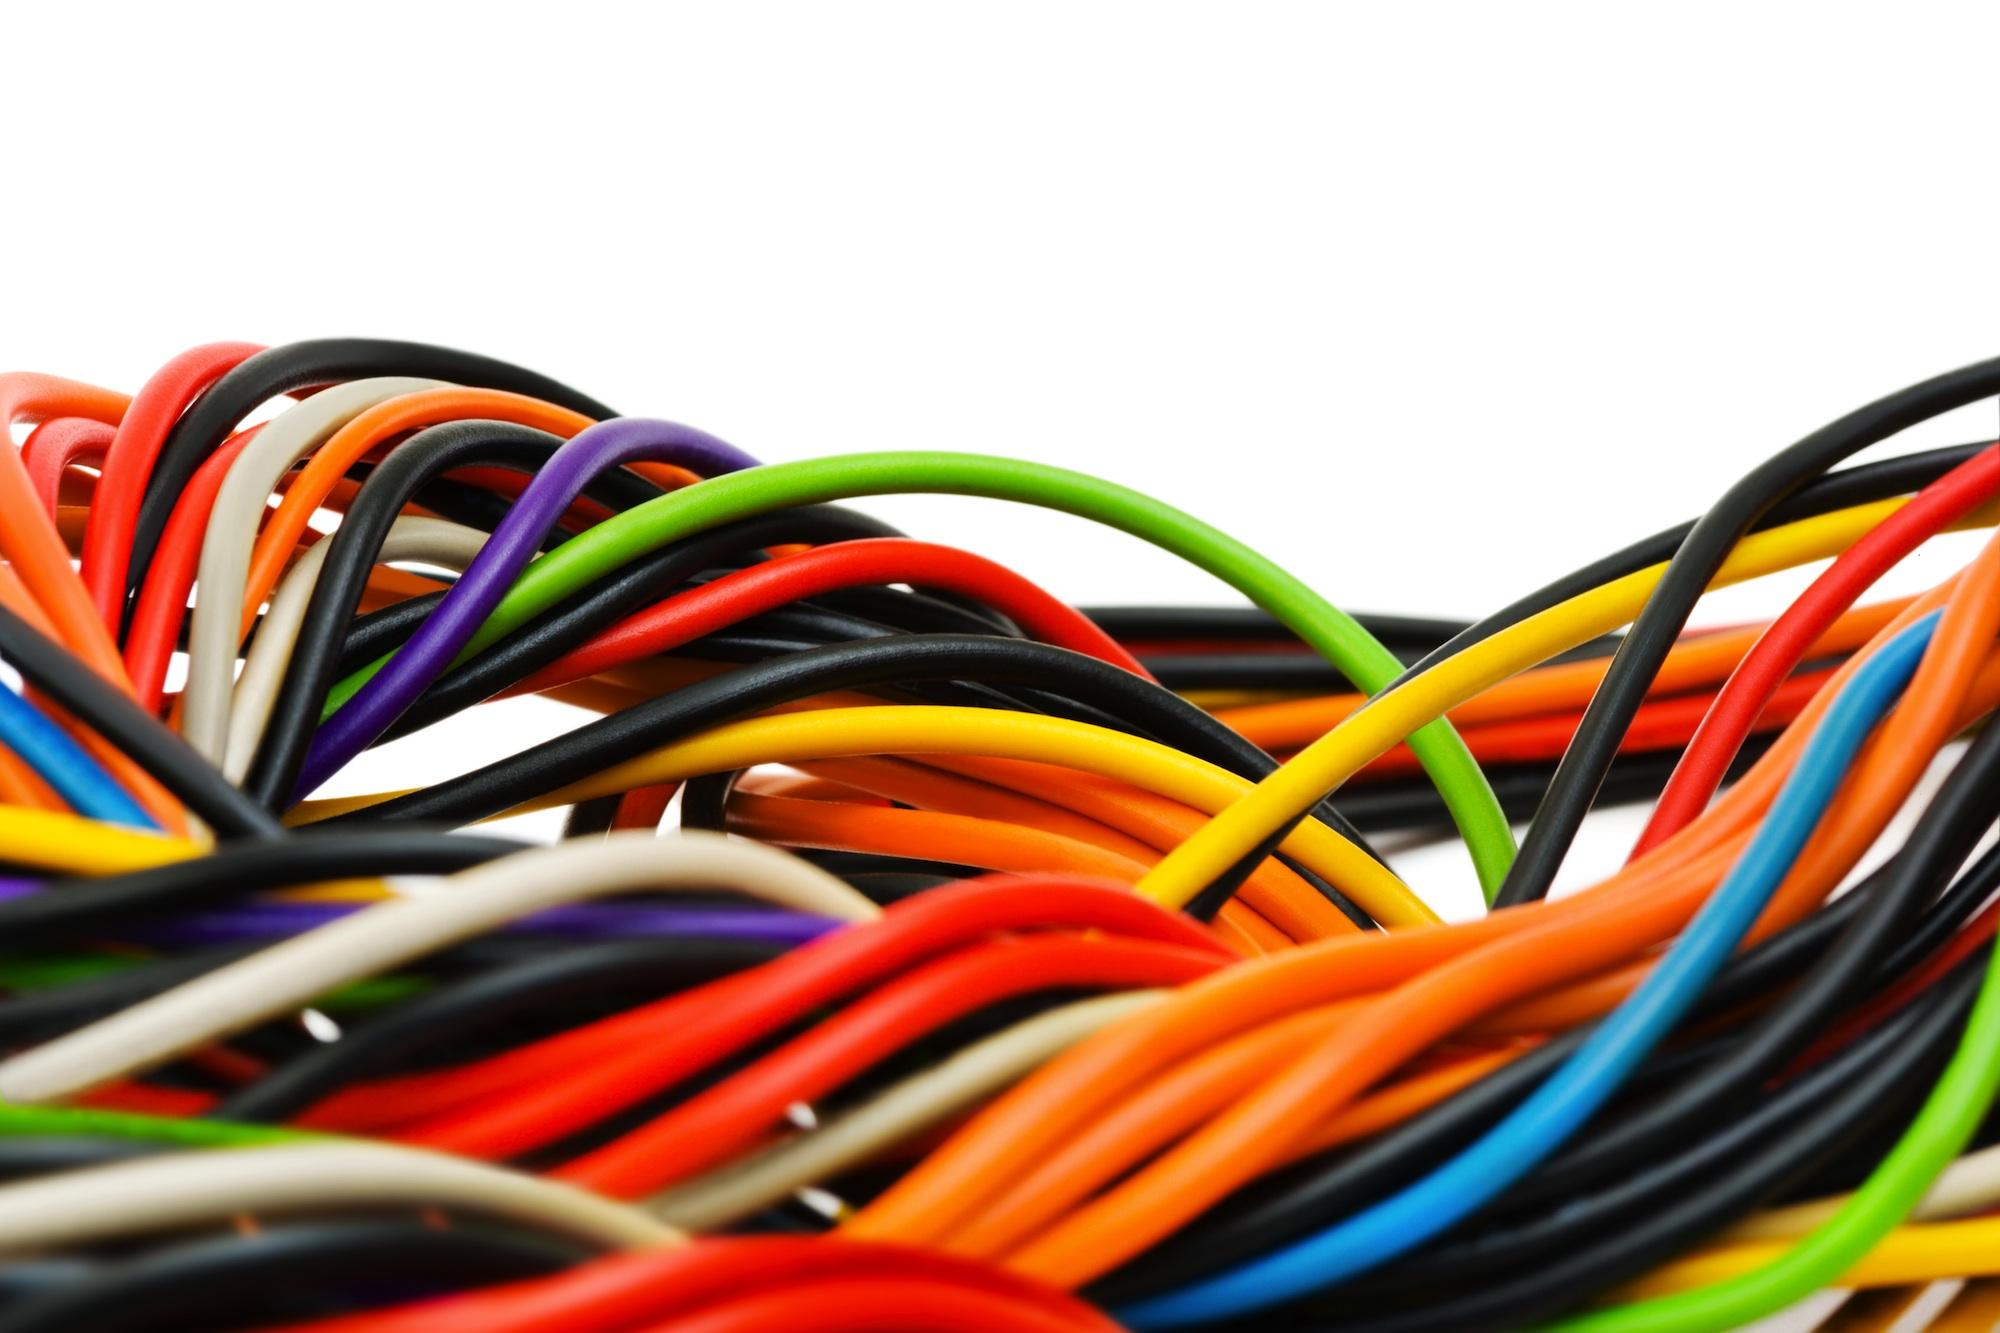 IBM 09L2529 Ssa Cable